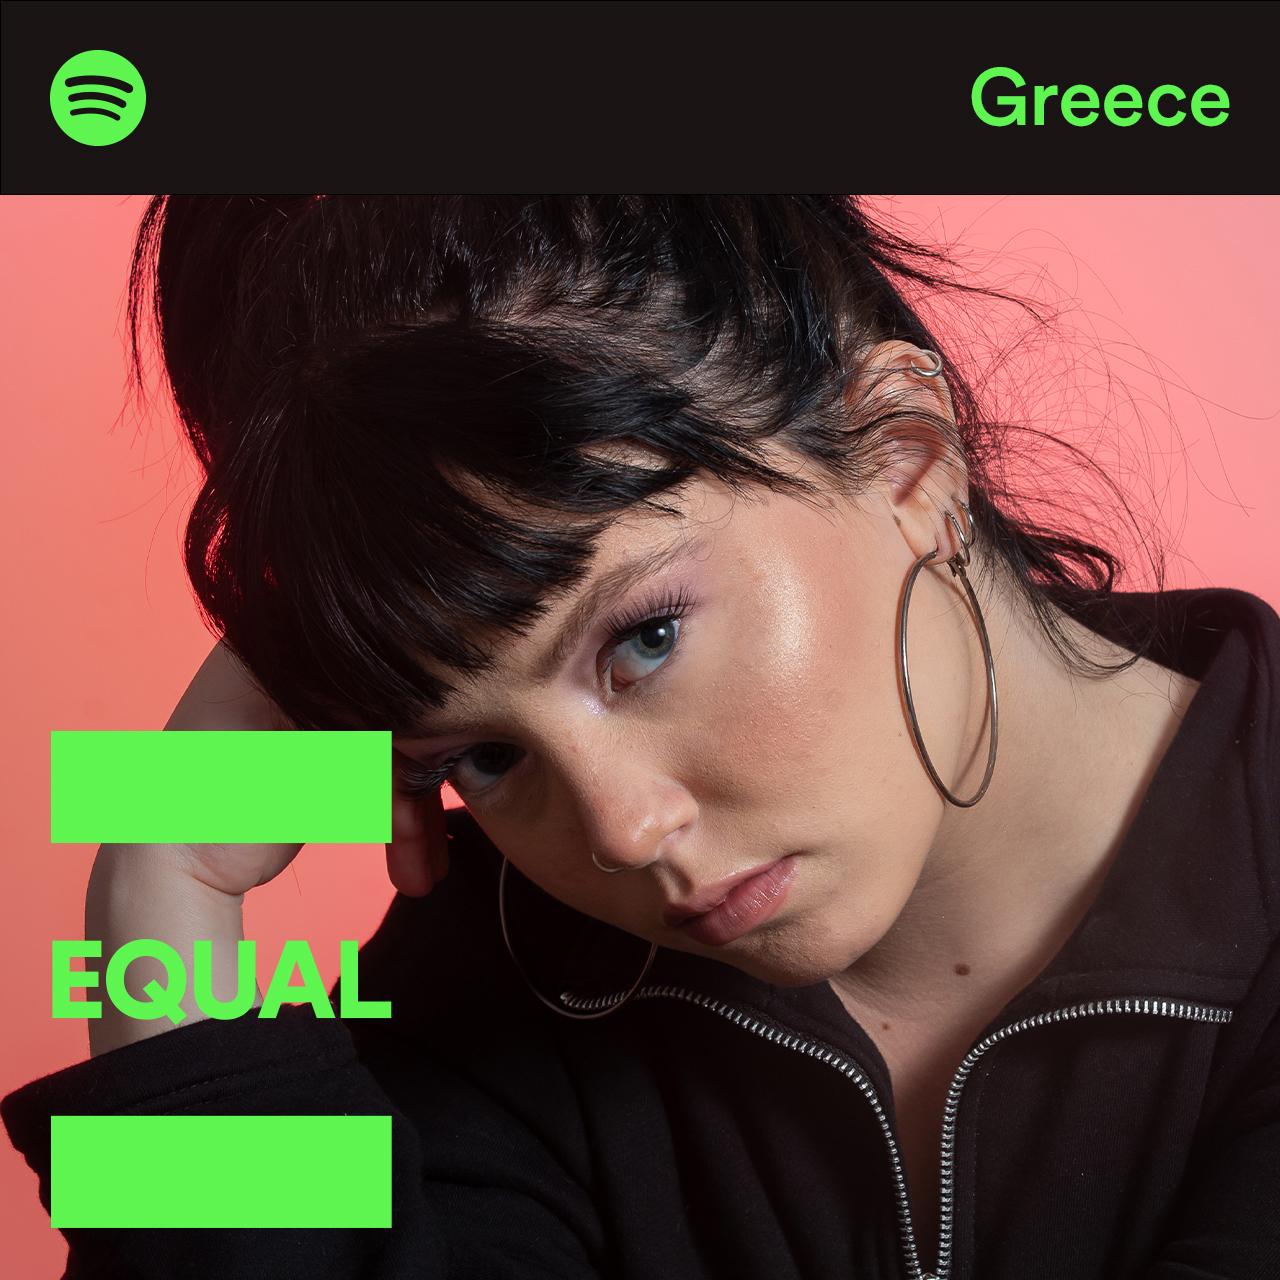 Marseaux | Η νεαρή pop star είναι η ambassador Ελλάδας και Κύπρου στην παγκόσμια καμπάνια του Spotify !